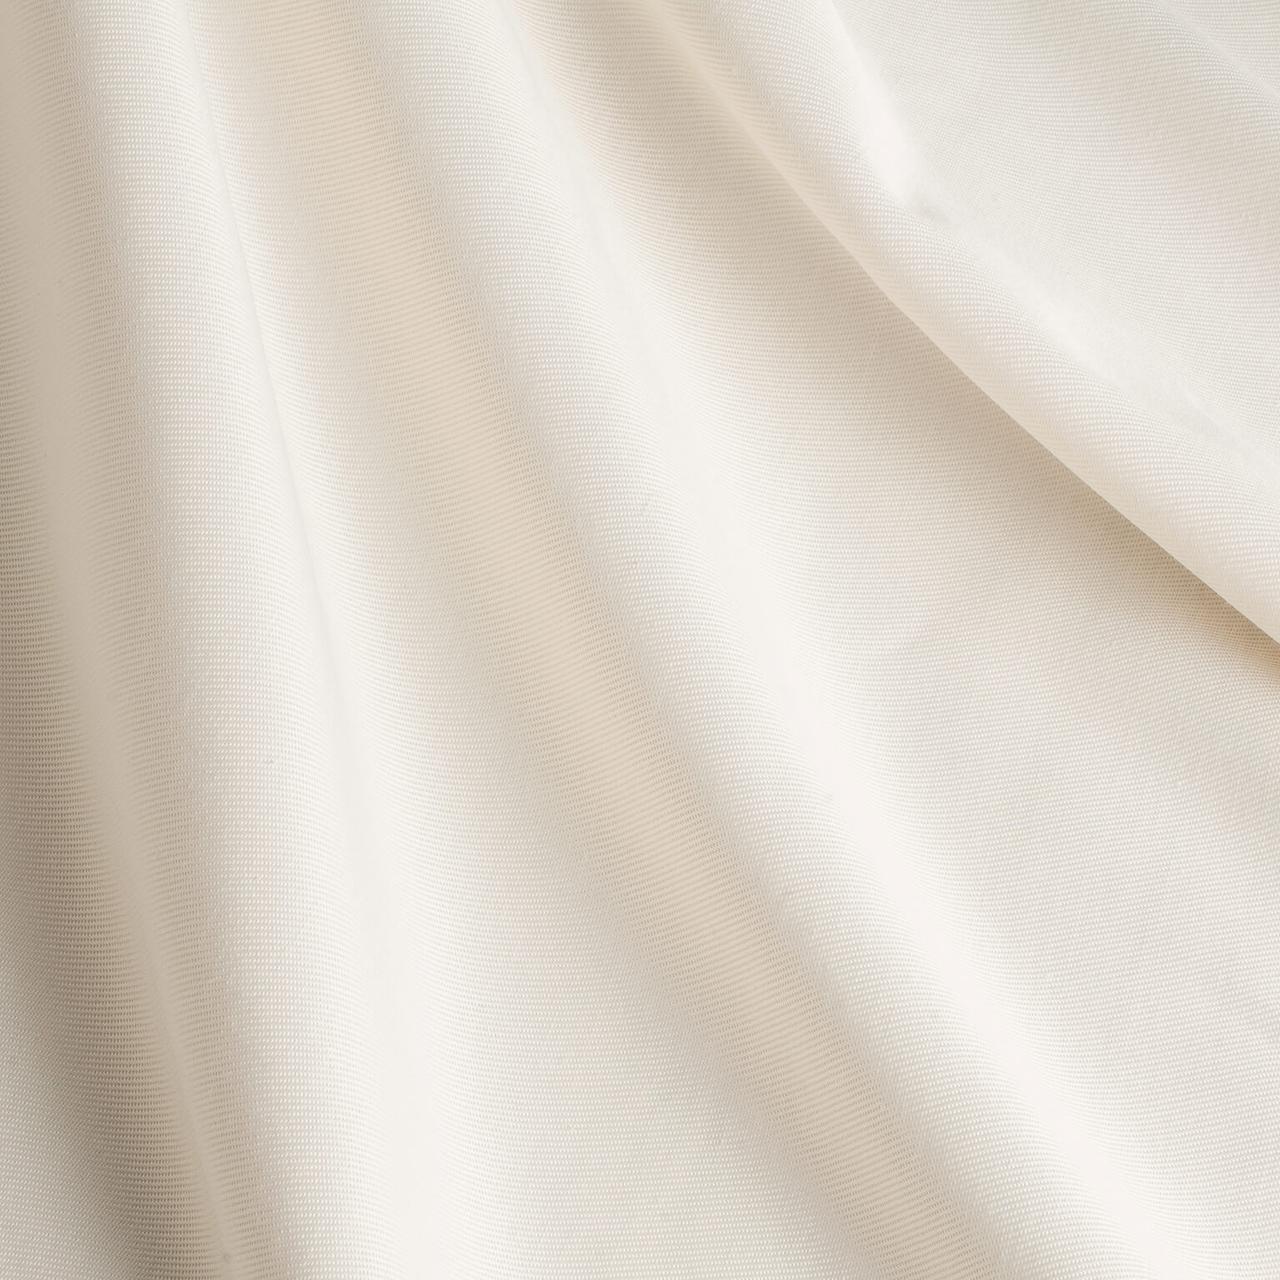 Ткань для скатертей и салфеток (ресторан) 320v6